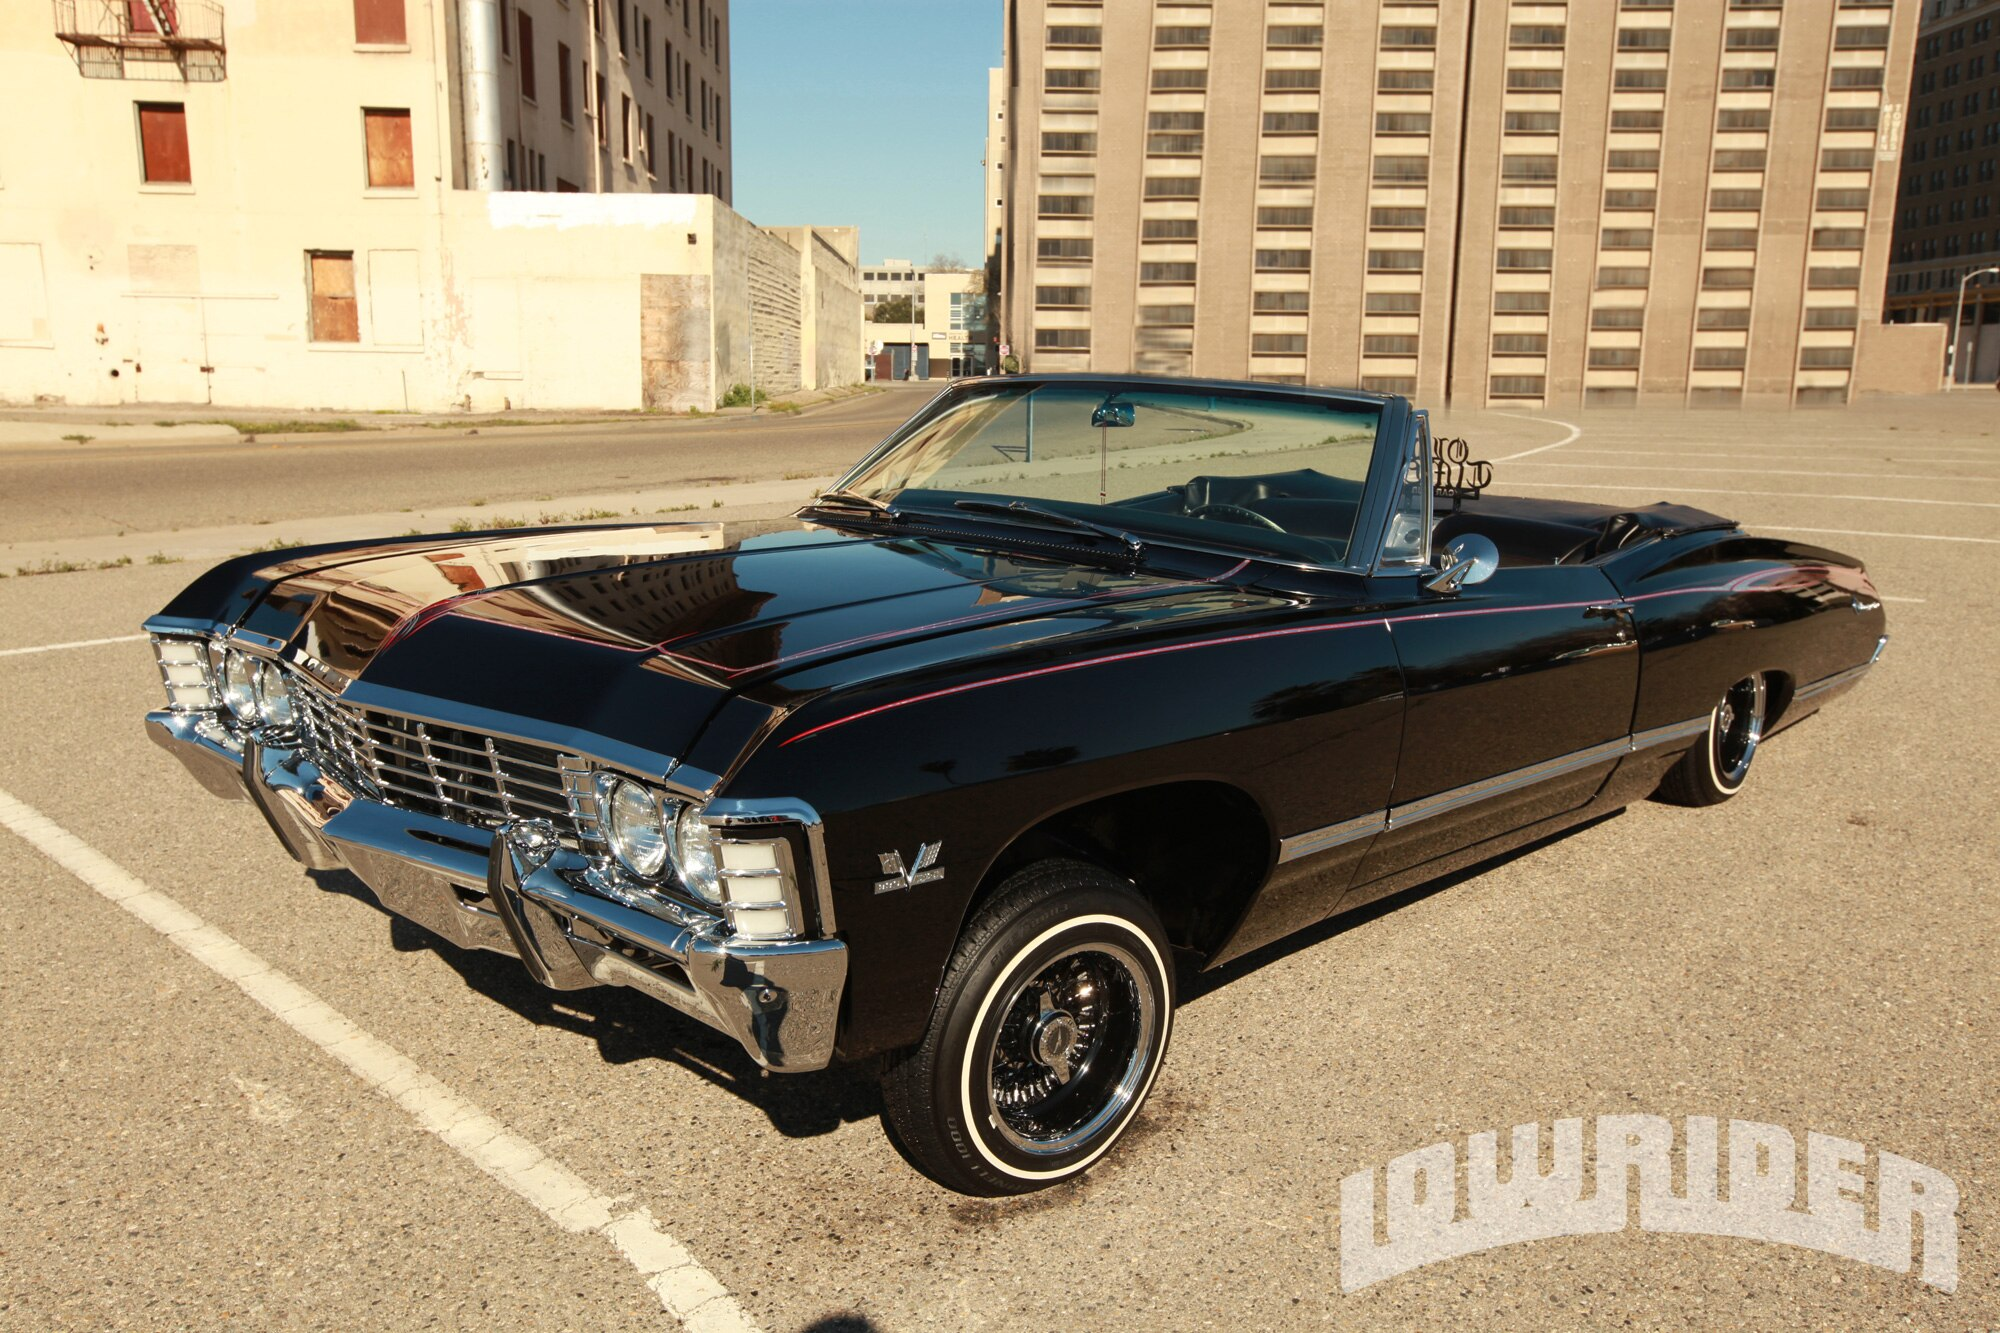 lrmp-1201-01-o-1967-chevrolet-impala-front